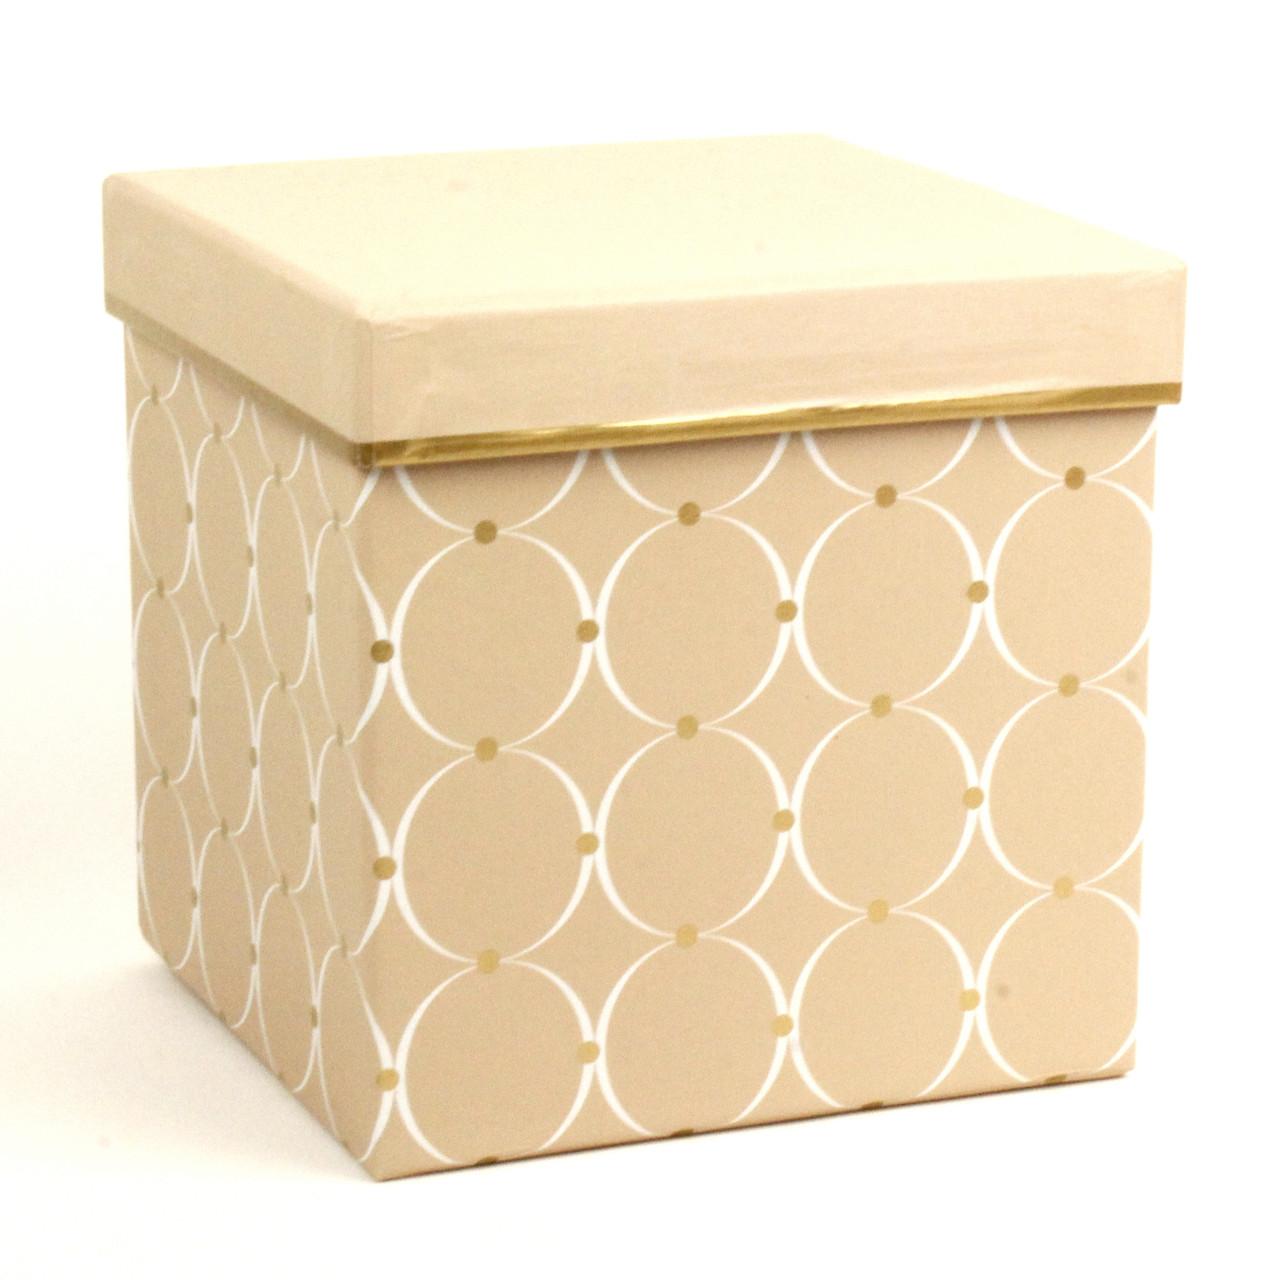 Подарочная коробка Bonne Surprise 13.5 x 13.5 см